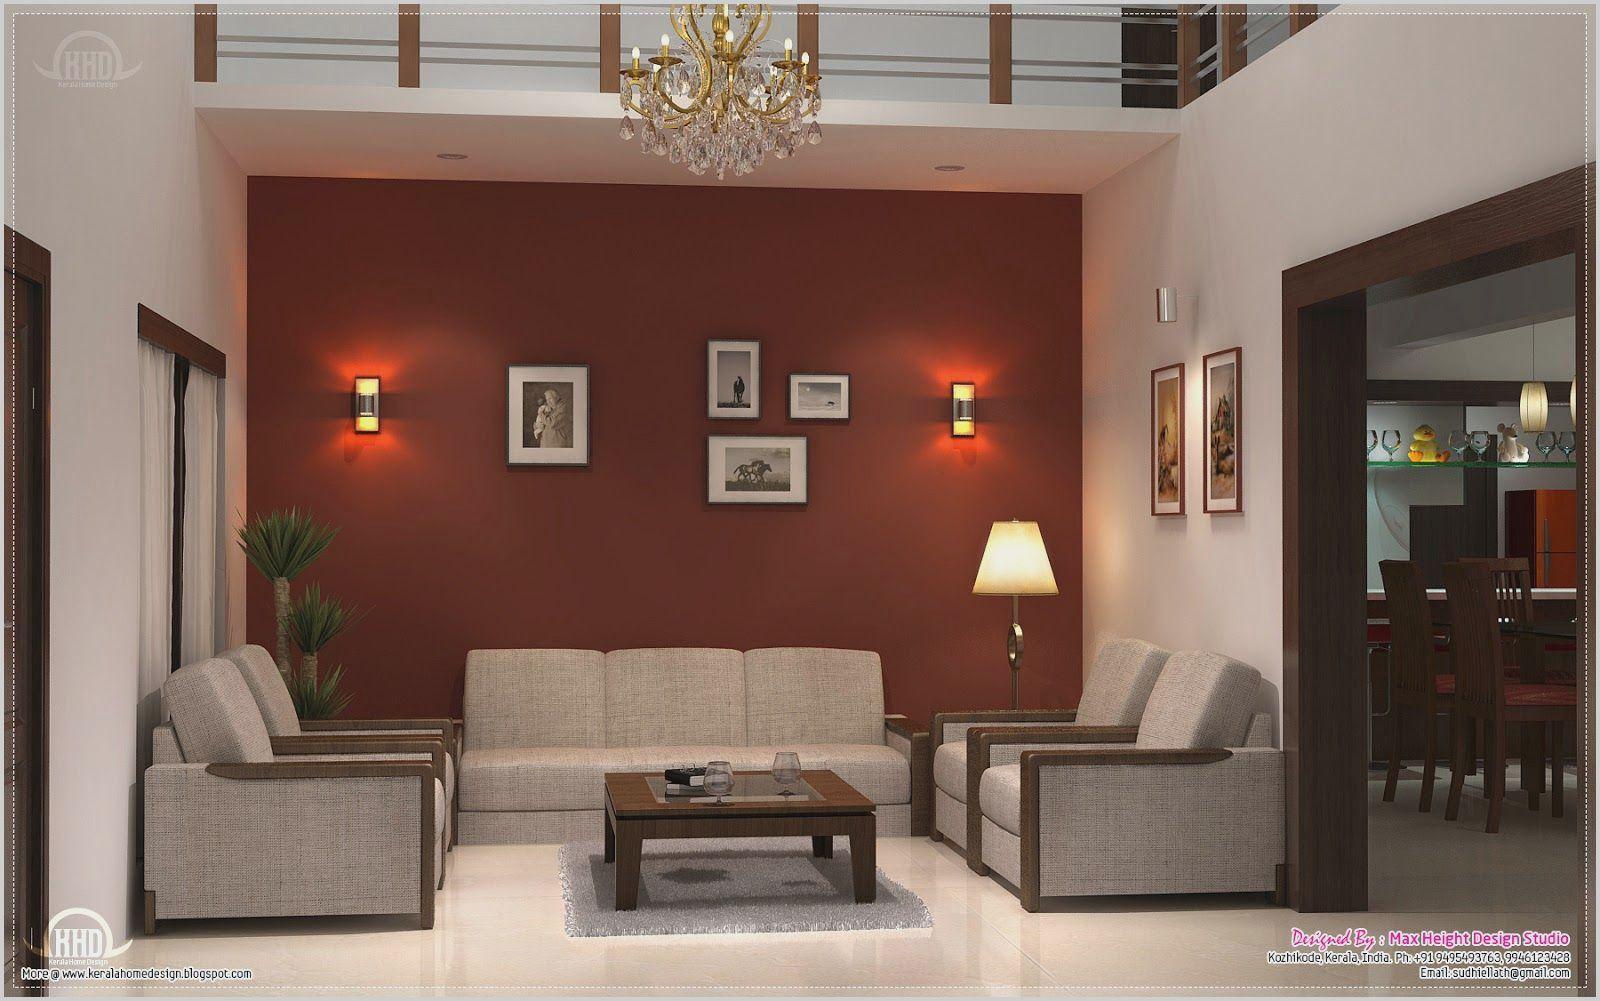 Living Room Designs India In 2020 Hall Interior Design Indian